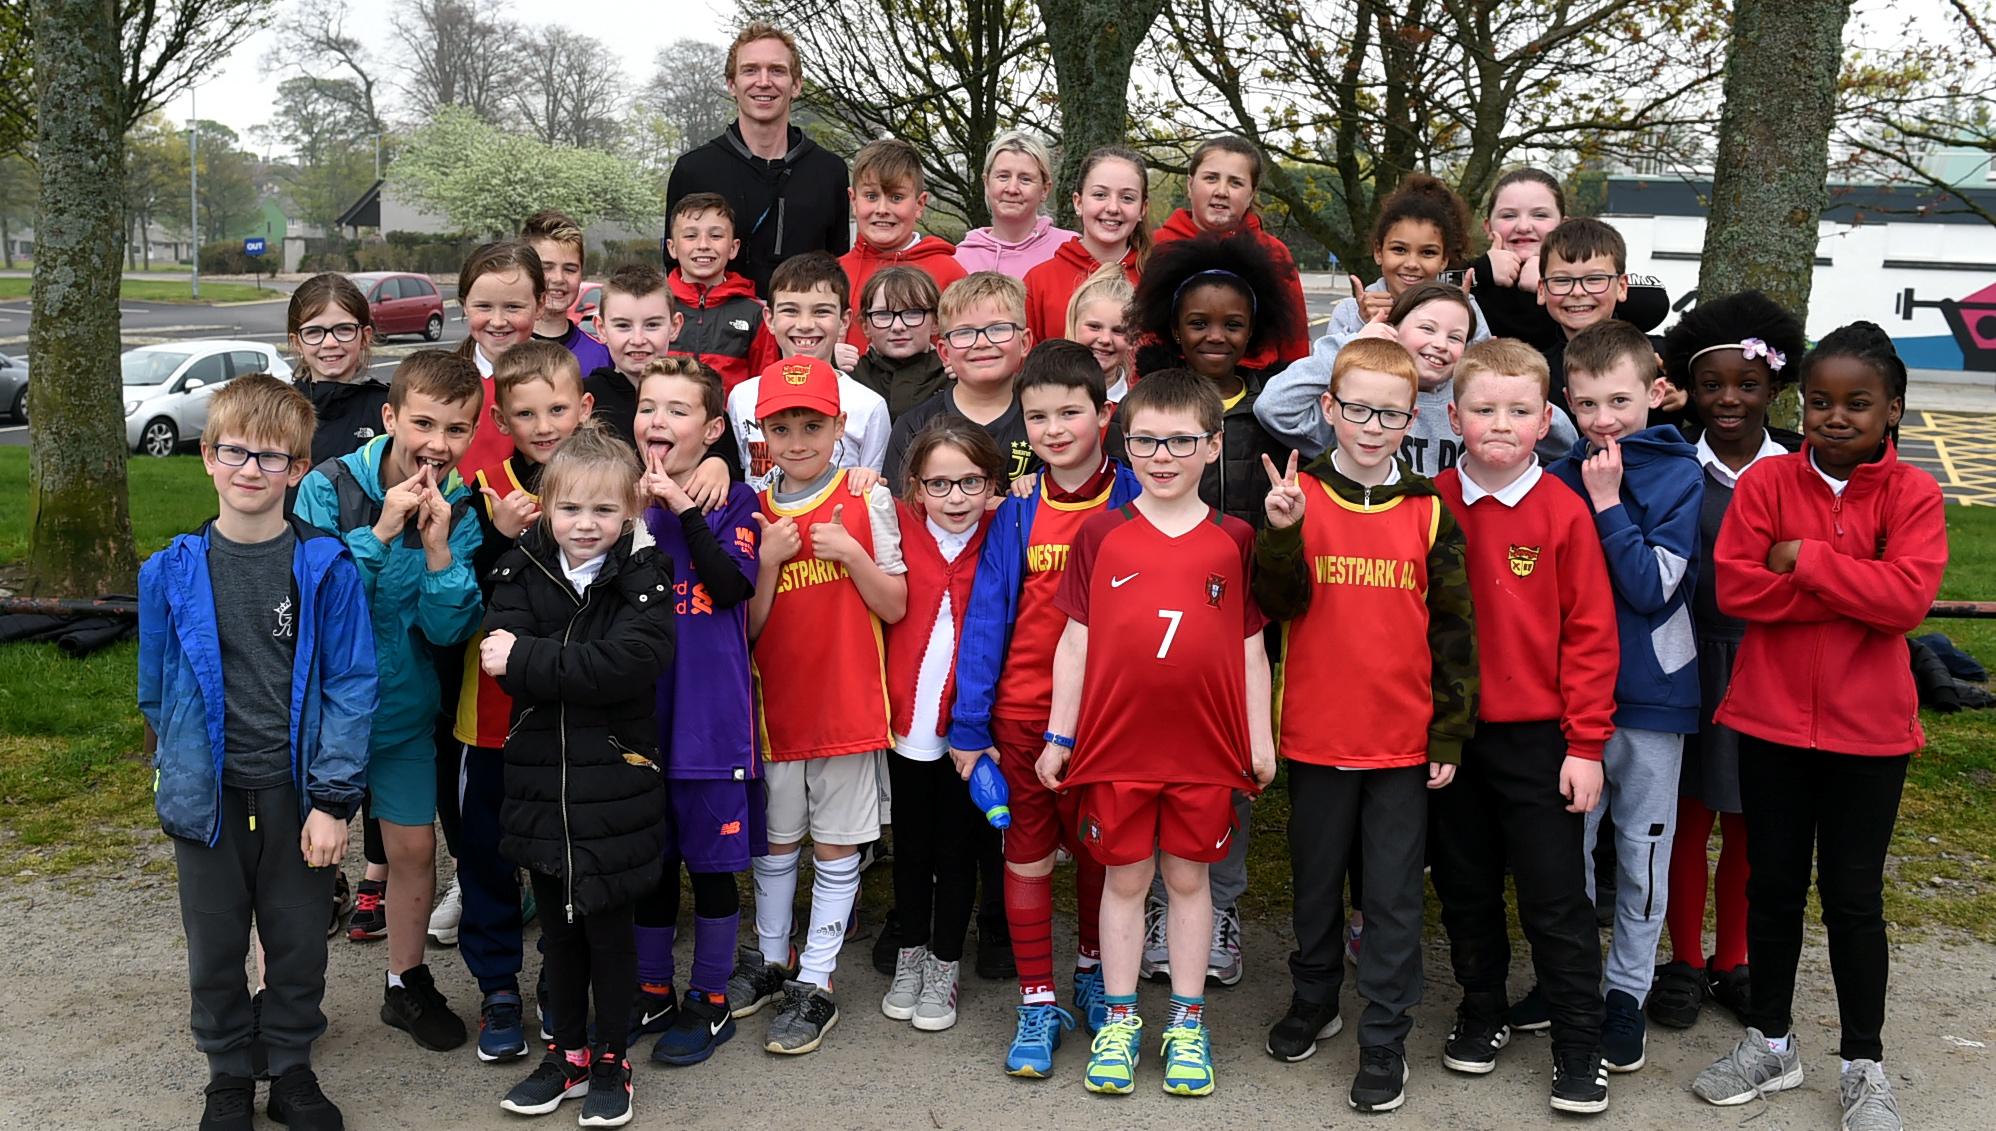 Westpark's athletics club with Nigel O'Neill, rear.